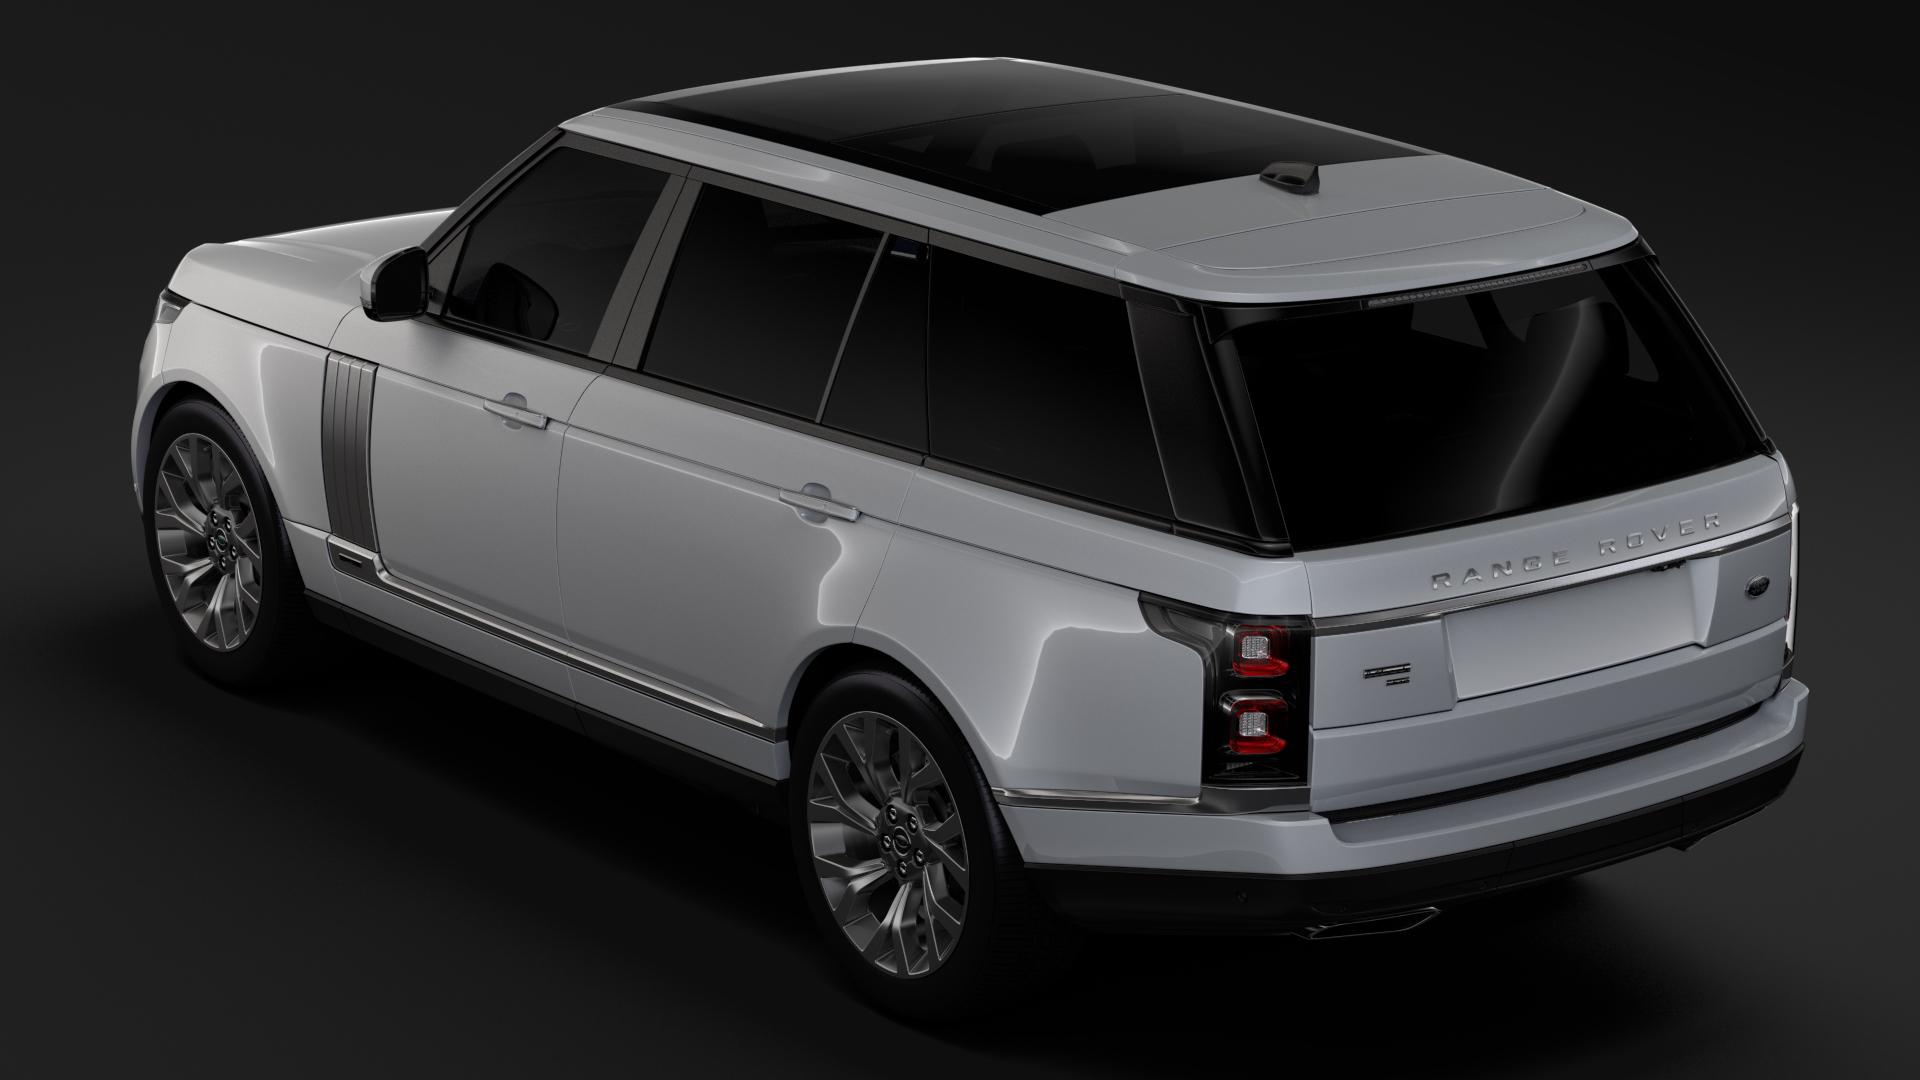 range rover autobiography p400e lwb l405 2018 3d model fbx c4d lwo ma mb hrc xsi obj 277360